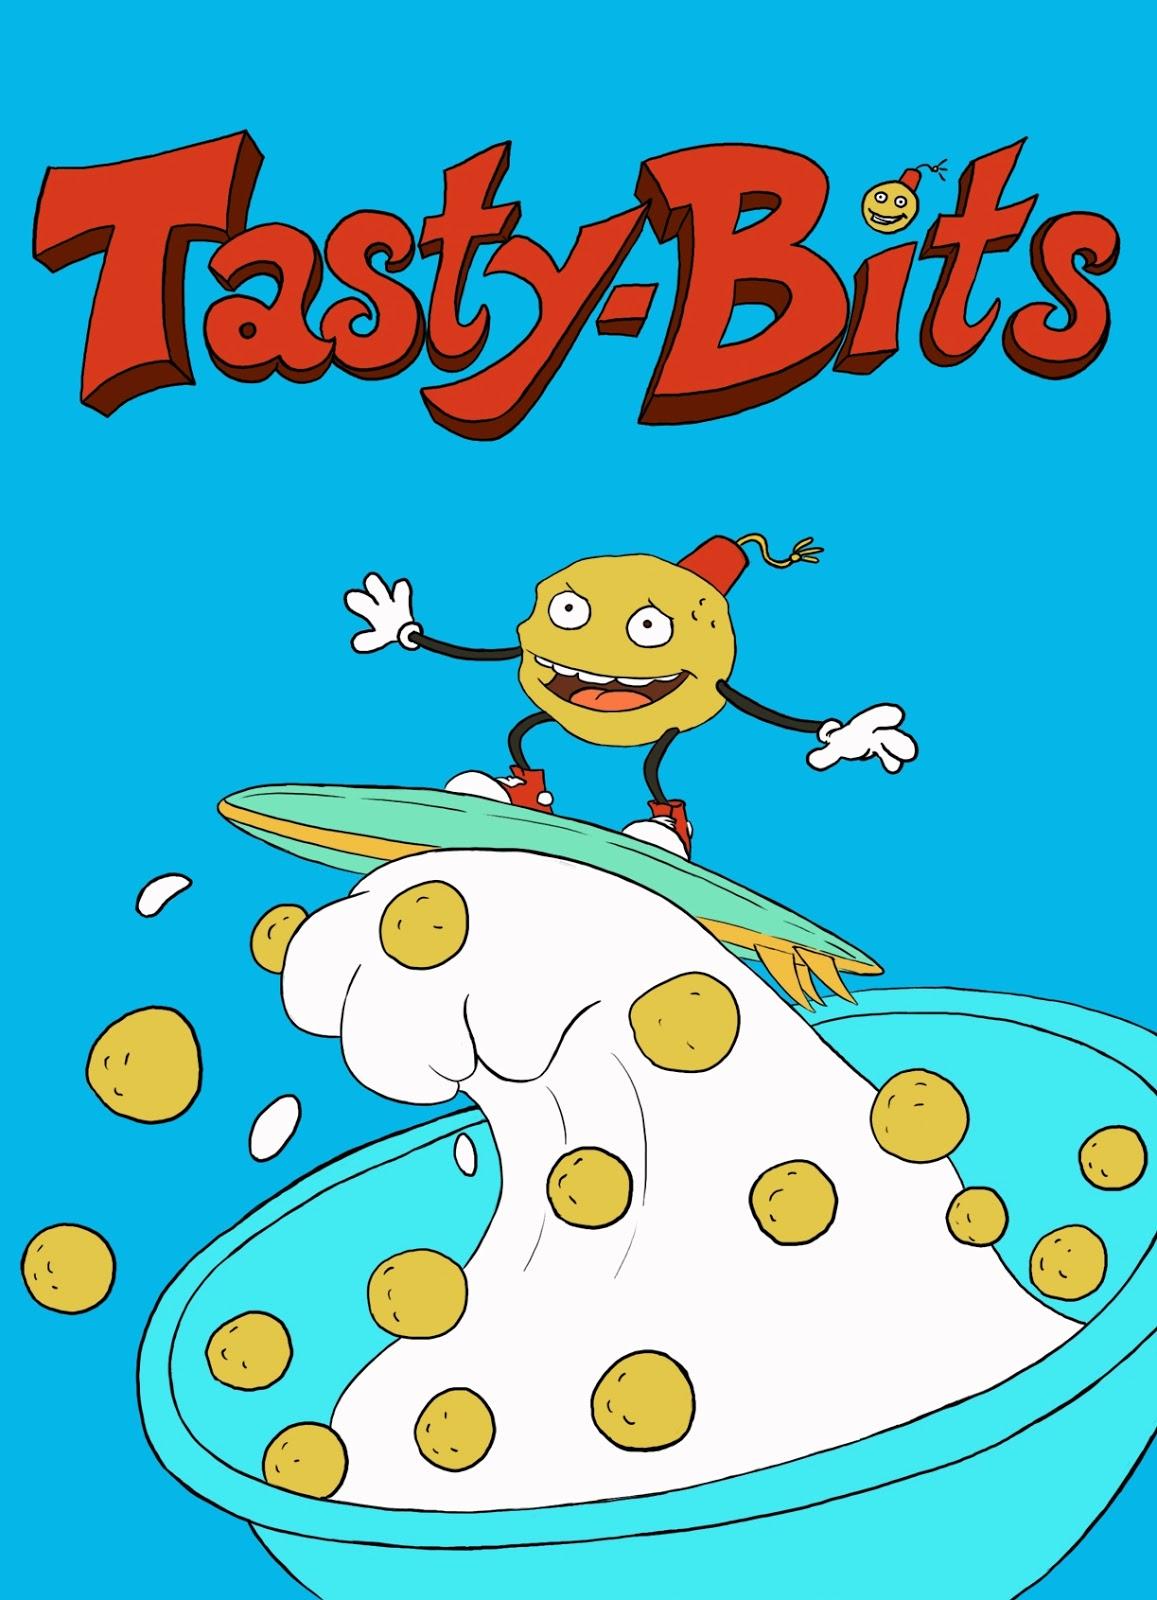 fysh's blog: Breakfast Cereal mascots